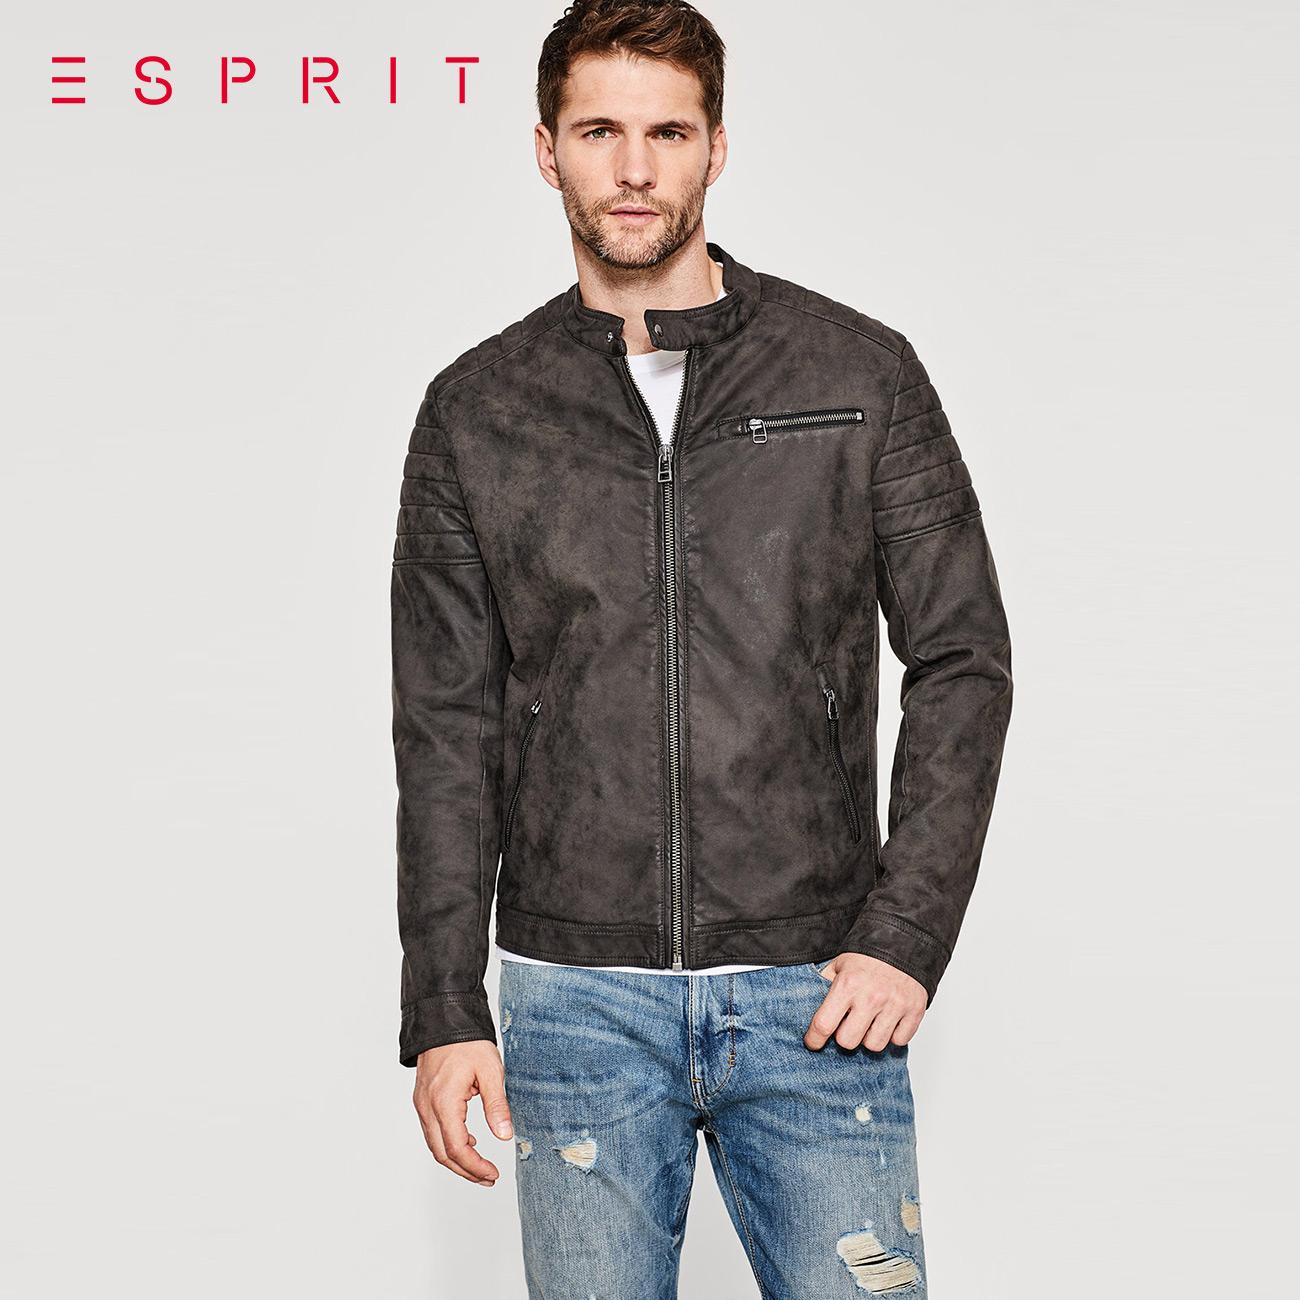 ESPRIT男装2017秋复古仿旧帅气立领夹克外套男-087EE2G015